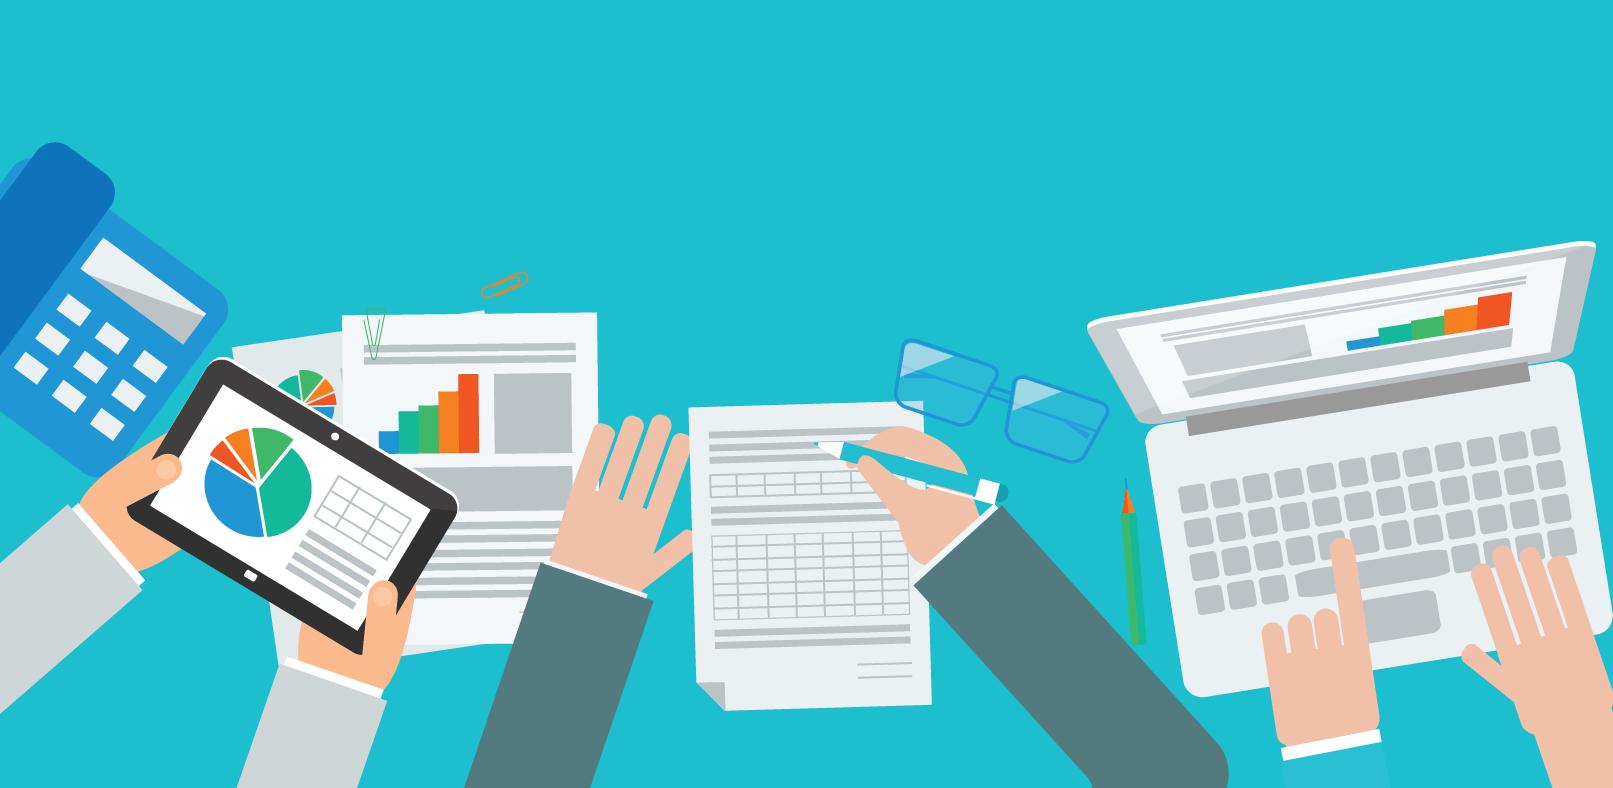 6 Accounting Skills In High Demand